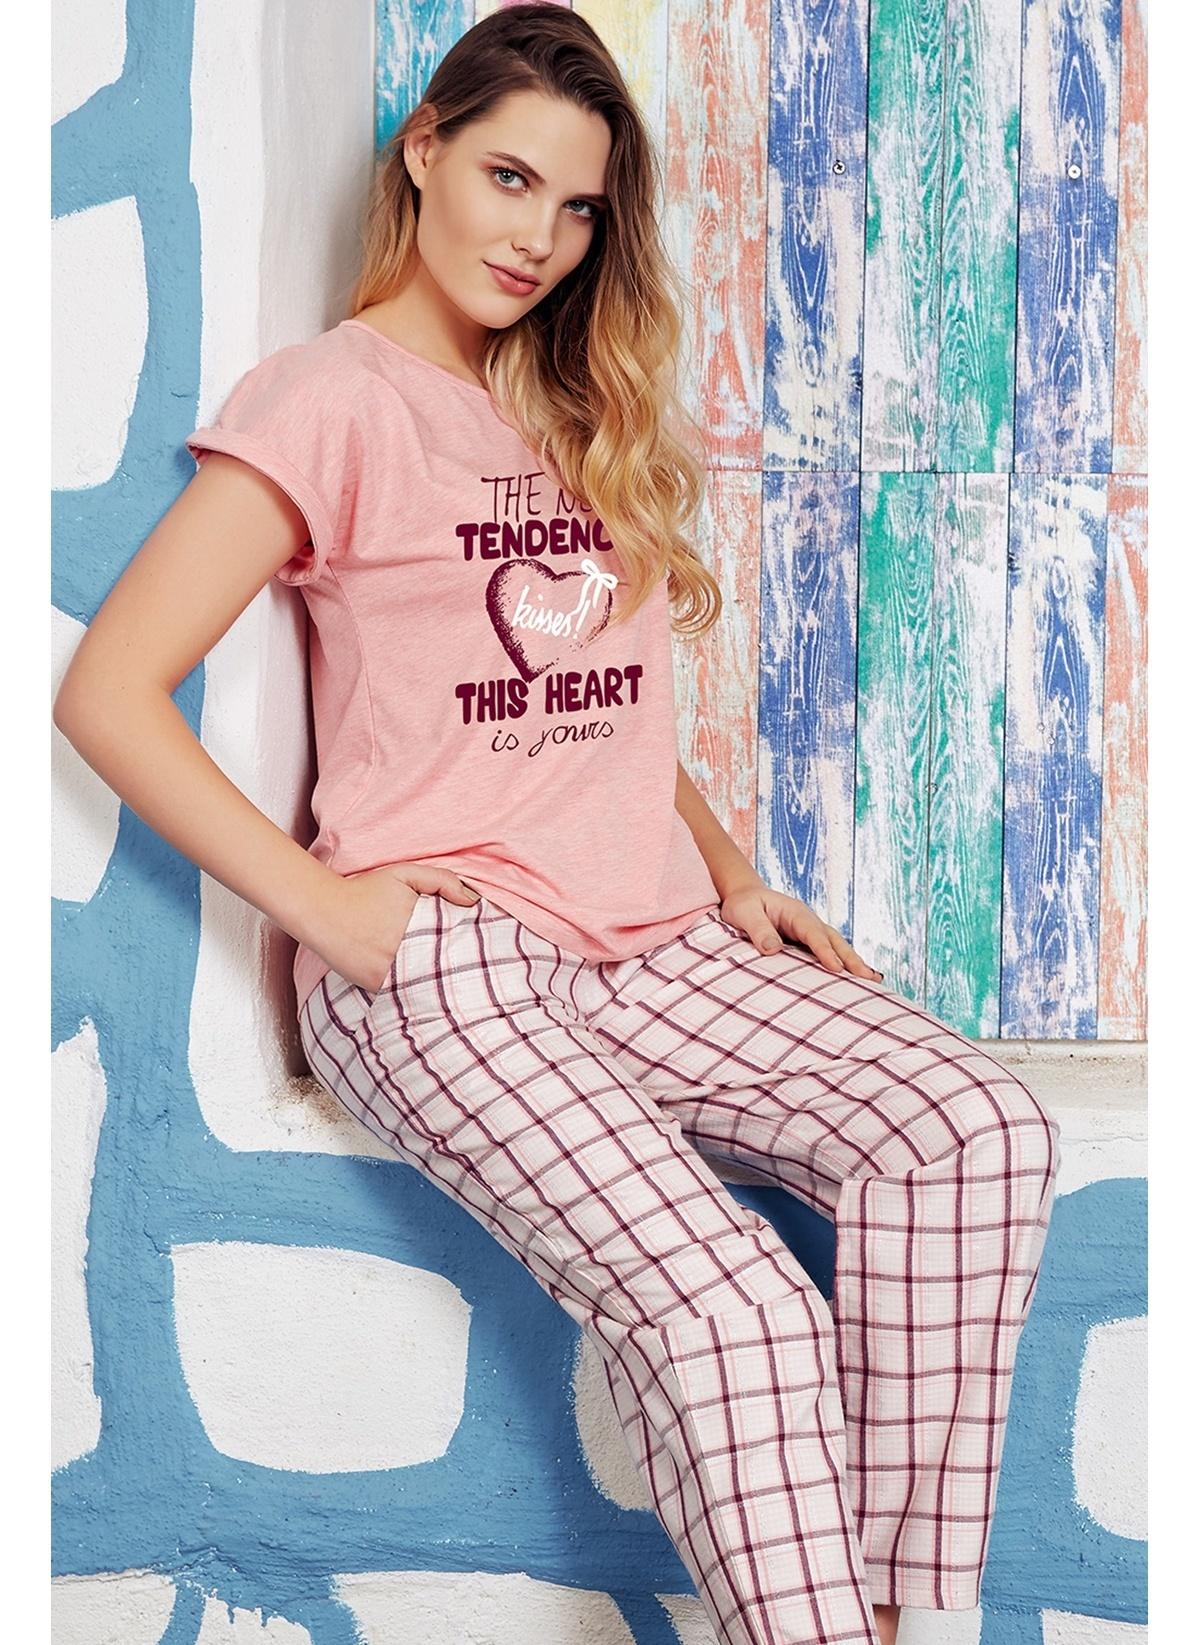 Anıl Kadın T-shirt Pijama Takım Man9532 Kadın T-shirt – 91.9 TL